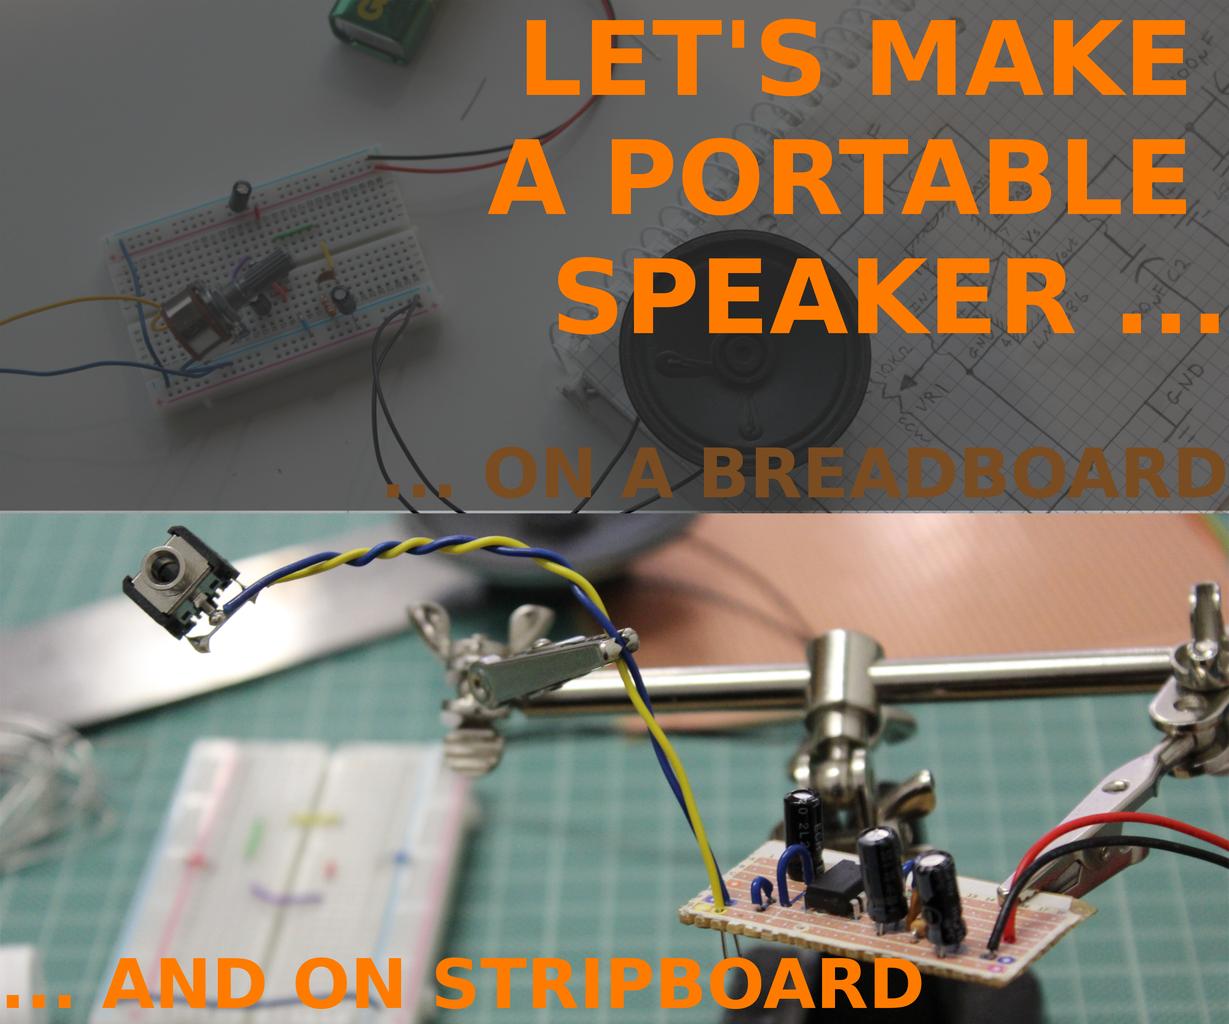 LET'S MAKE THE PORTABLE SPEAKER ON STRIPBOARD